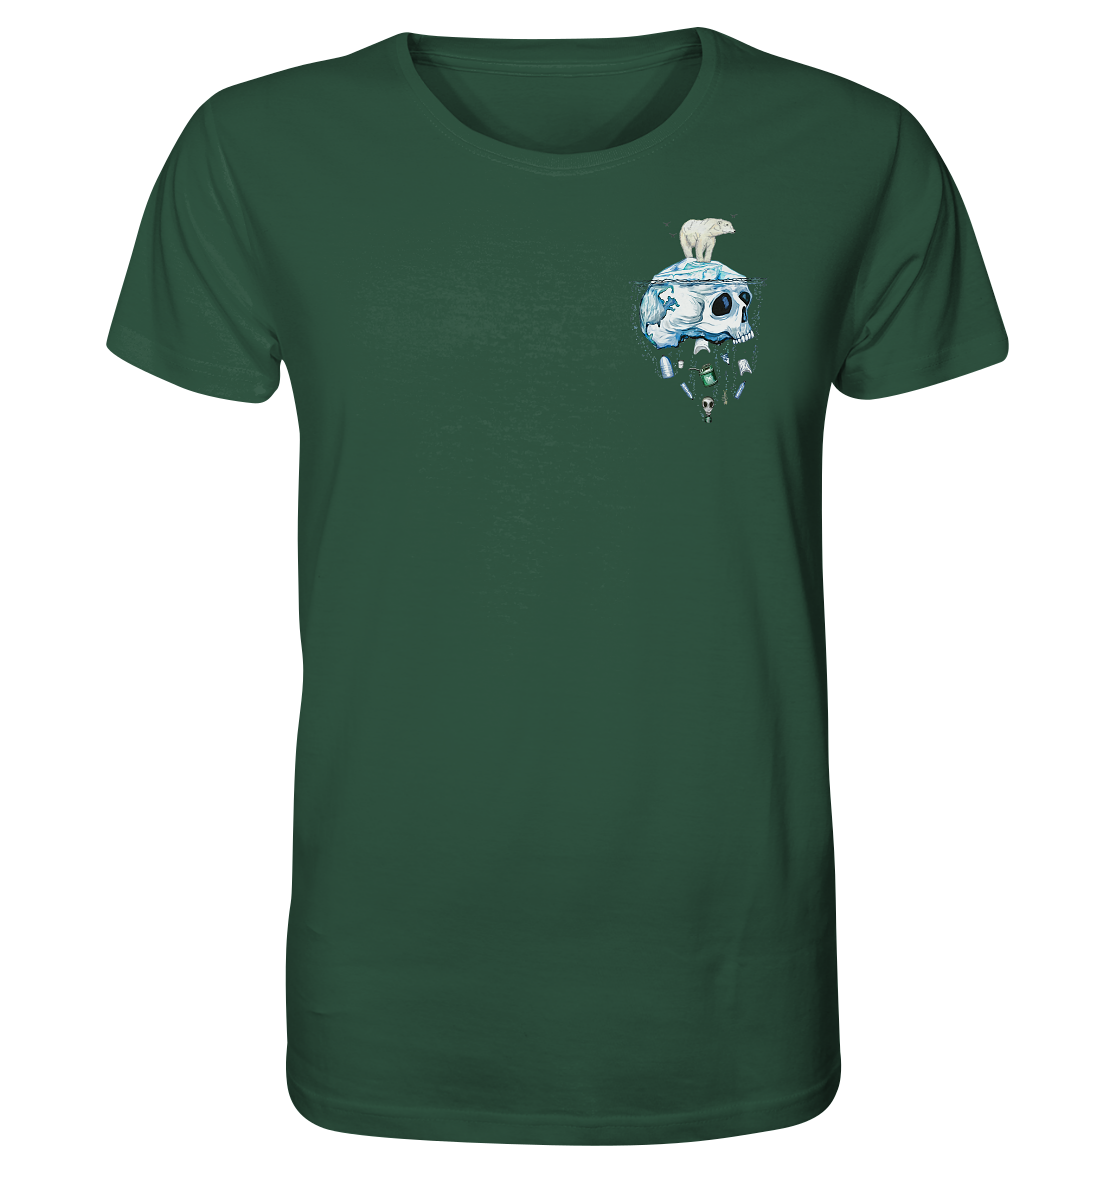 front-organic-shirt-2f5240-1116x-3.png